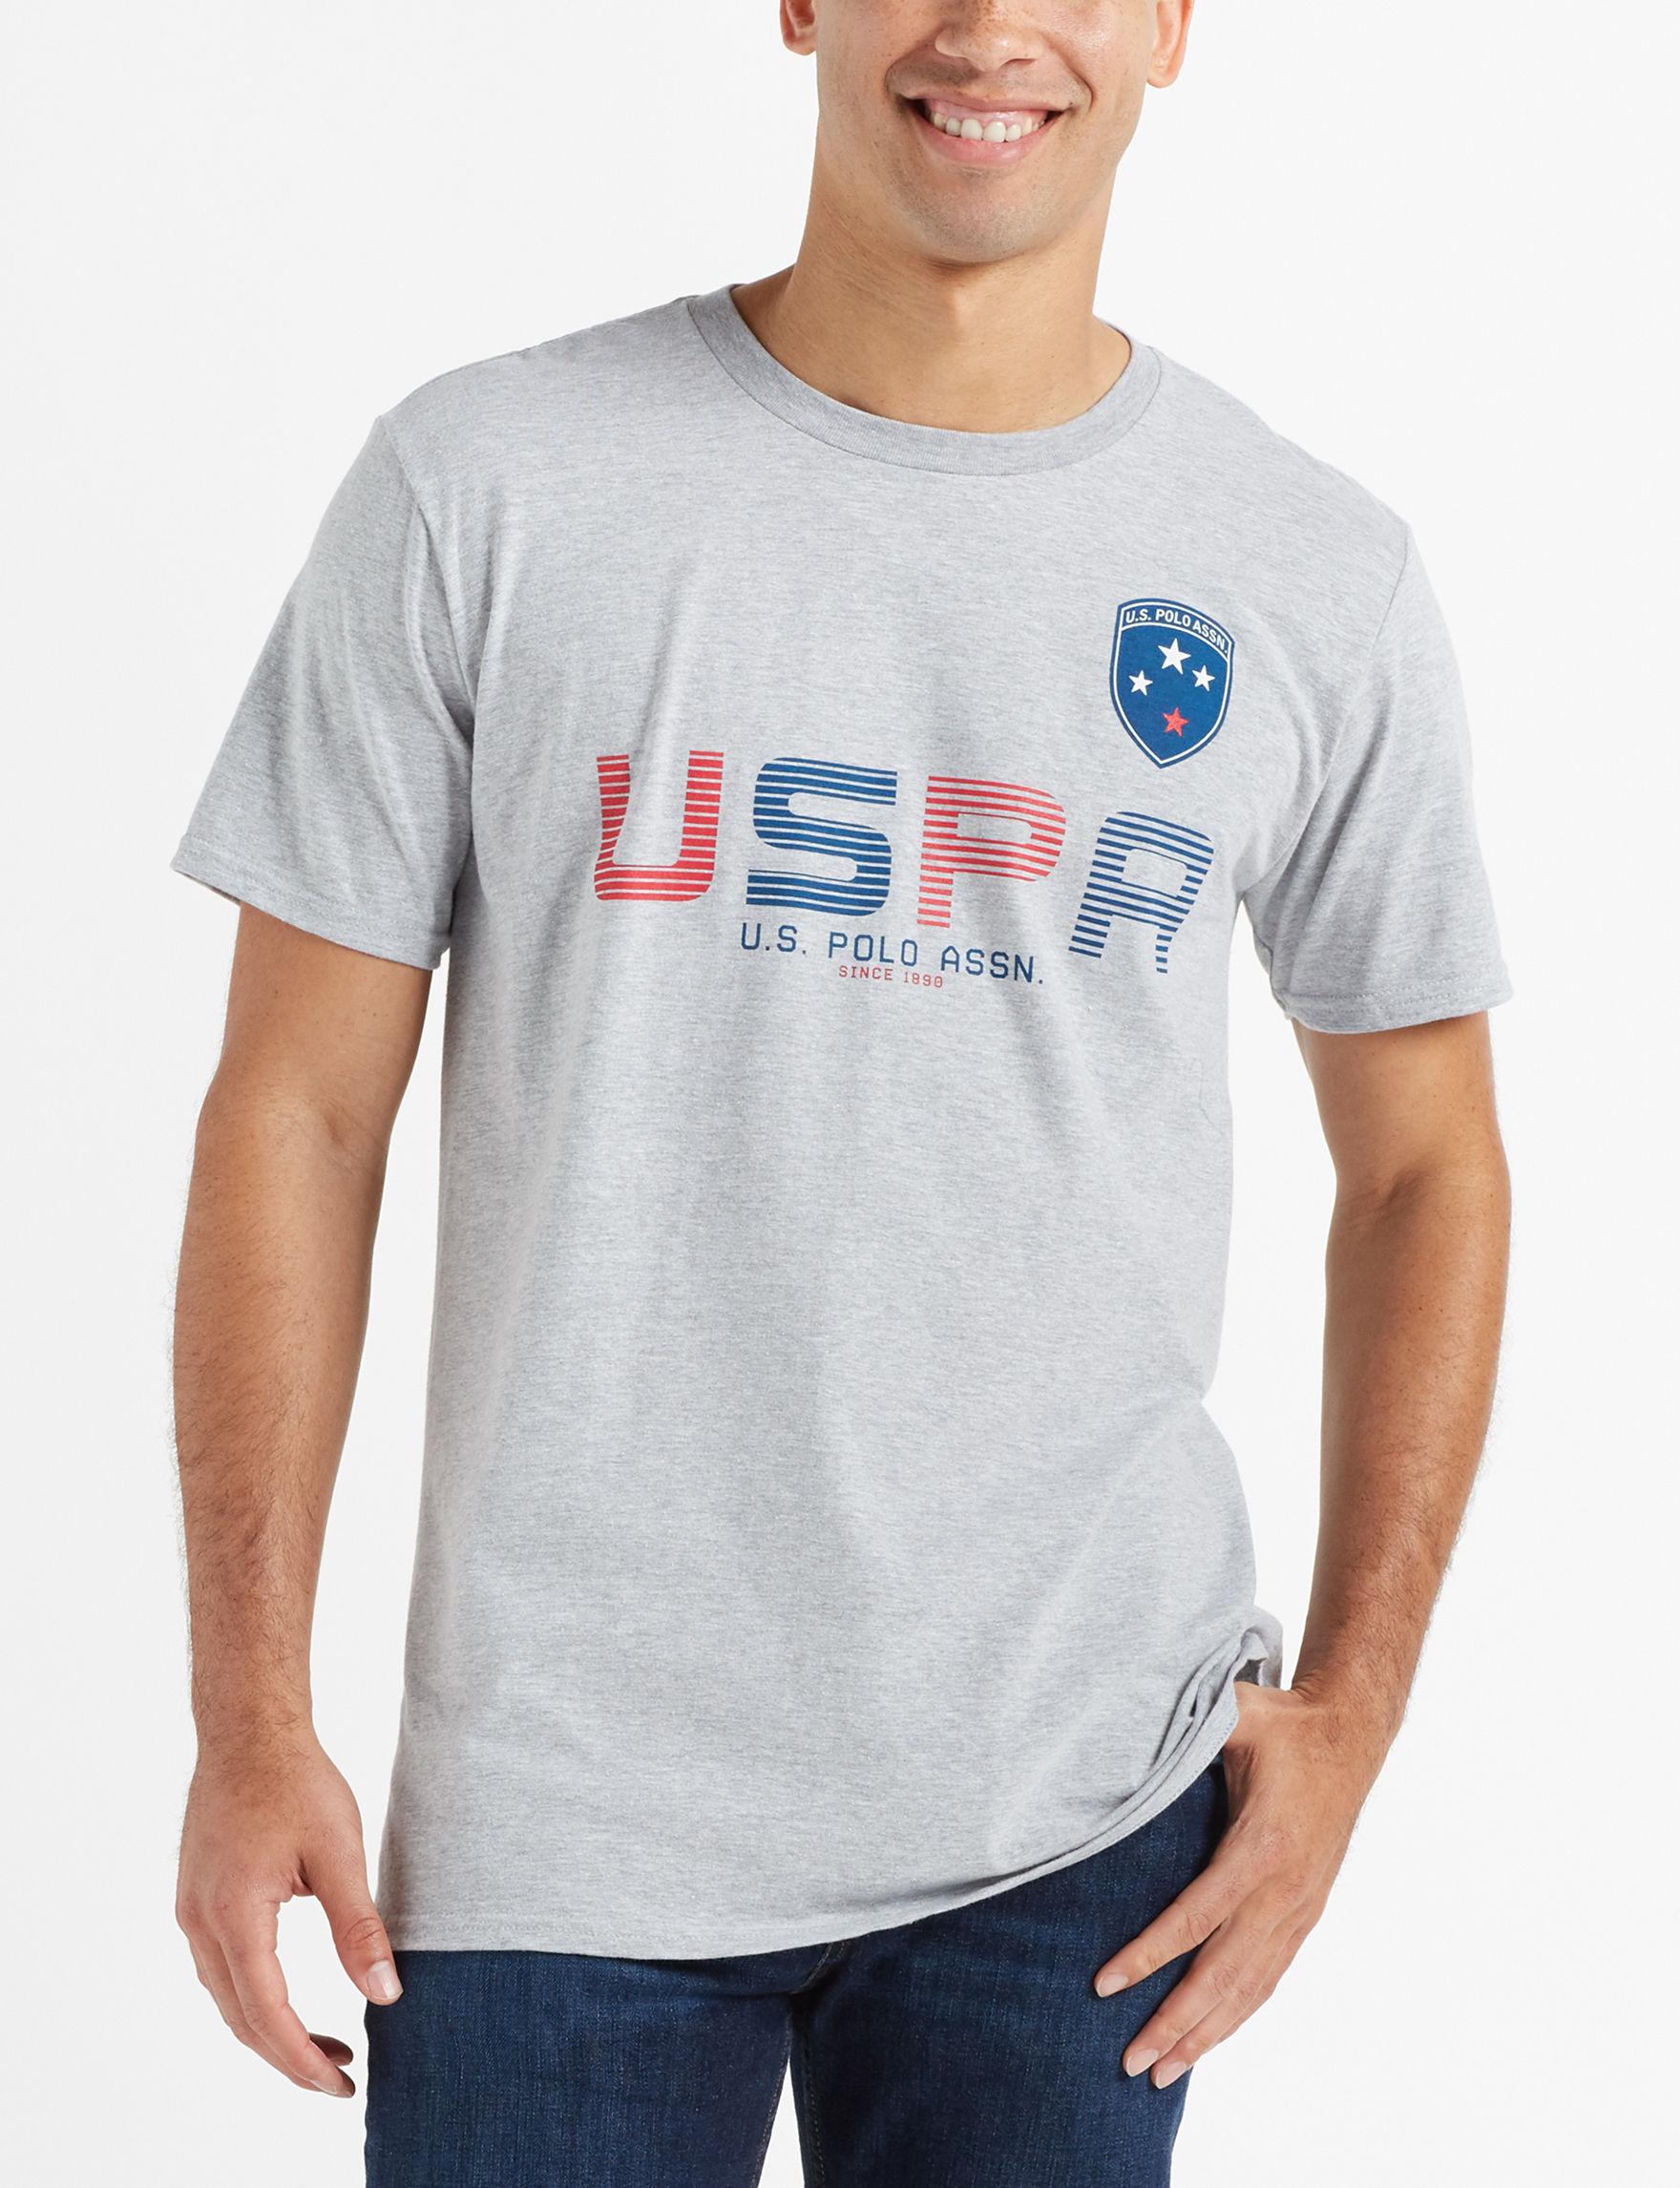 U.S. Polo Assn. Grey / Multi Tees & Tanks